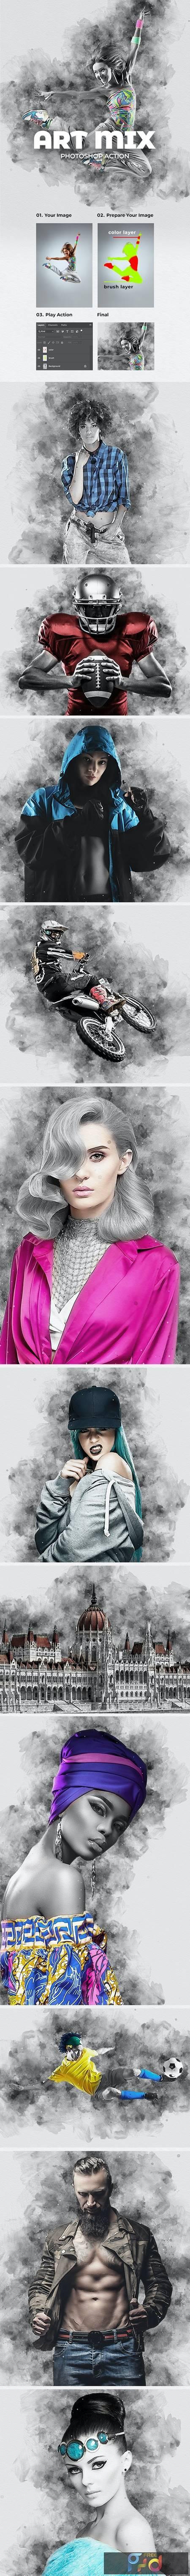 Art Mix Photoshop Action 28178955 1